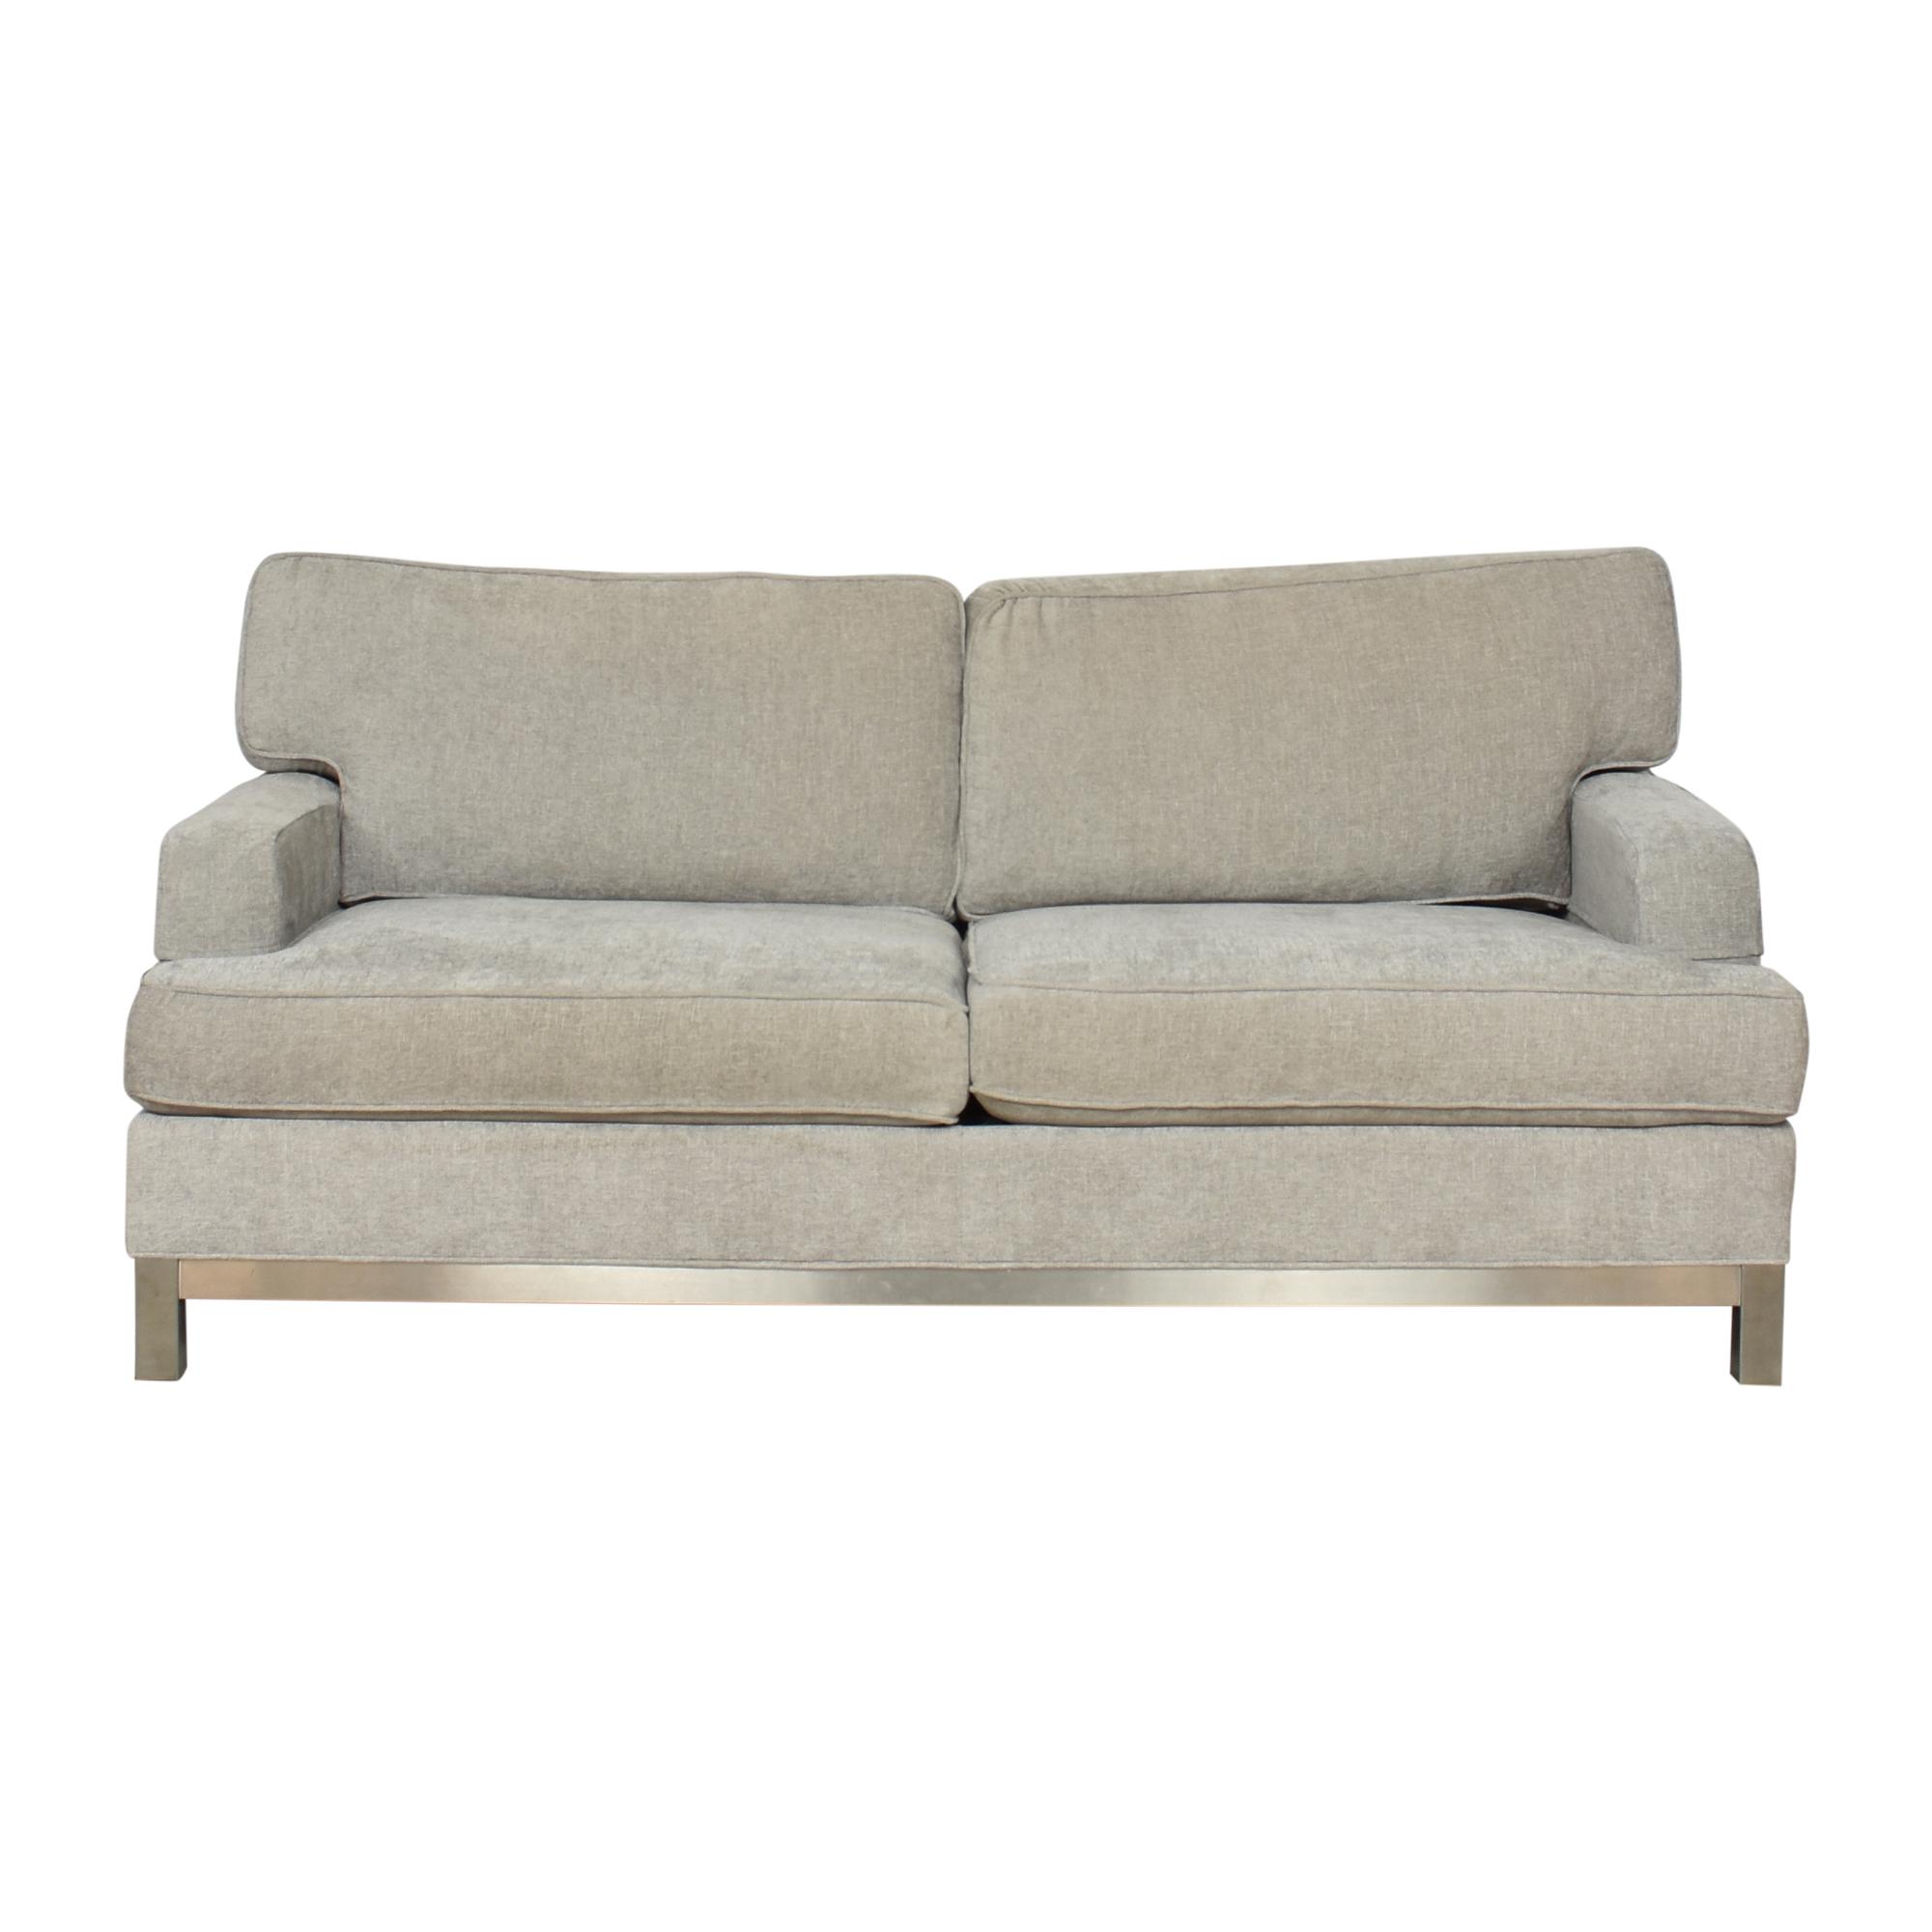 shop Ethan Allen Two Cushion Sofa Ethan Allen Sofas